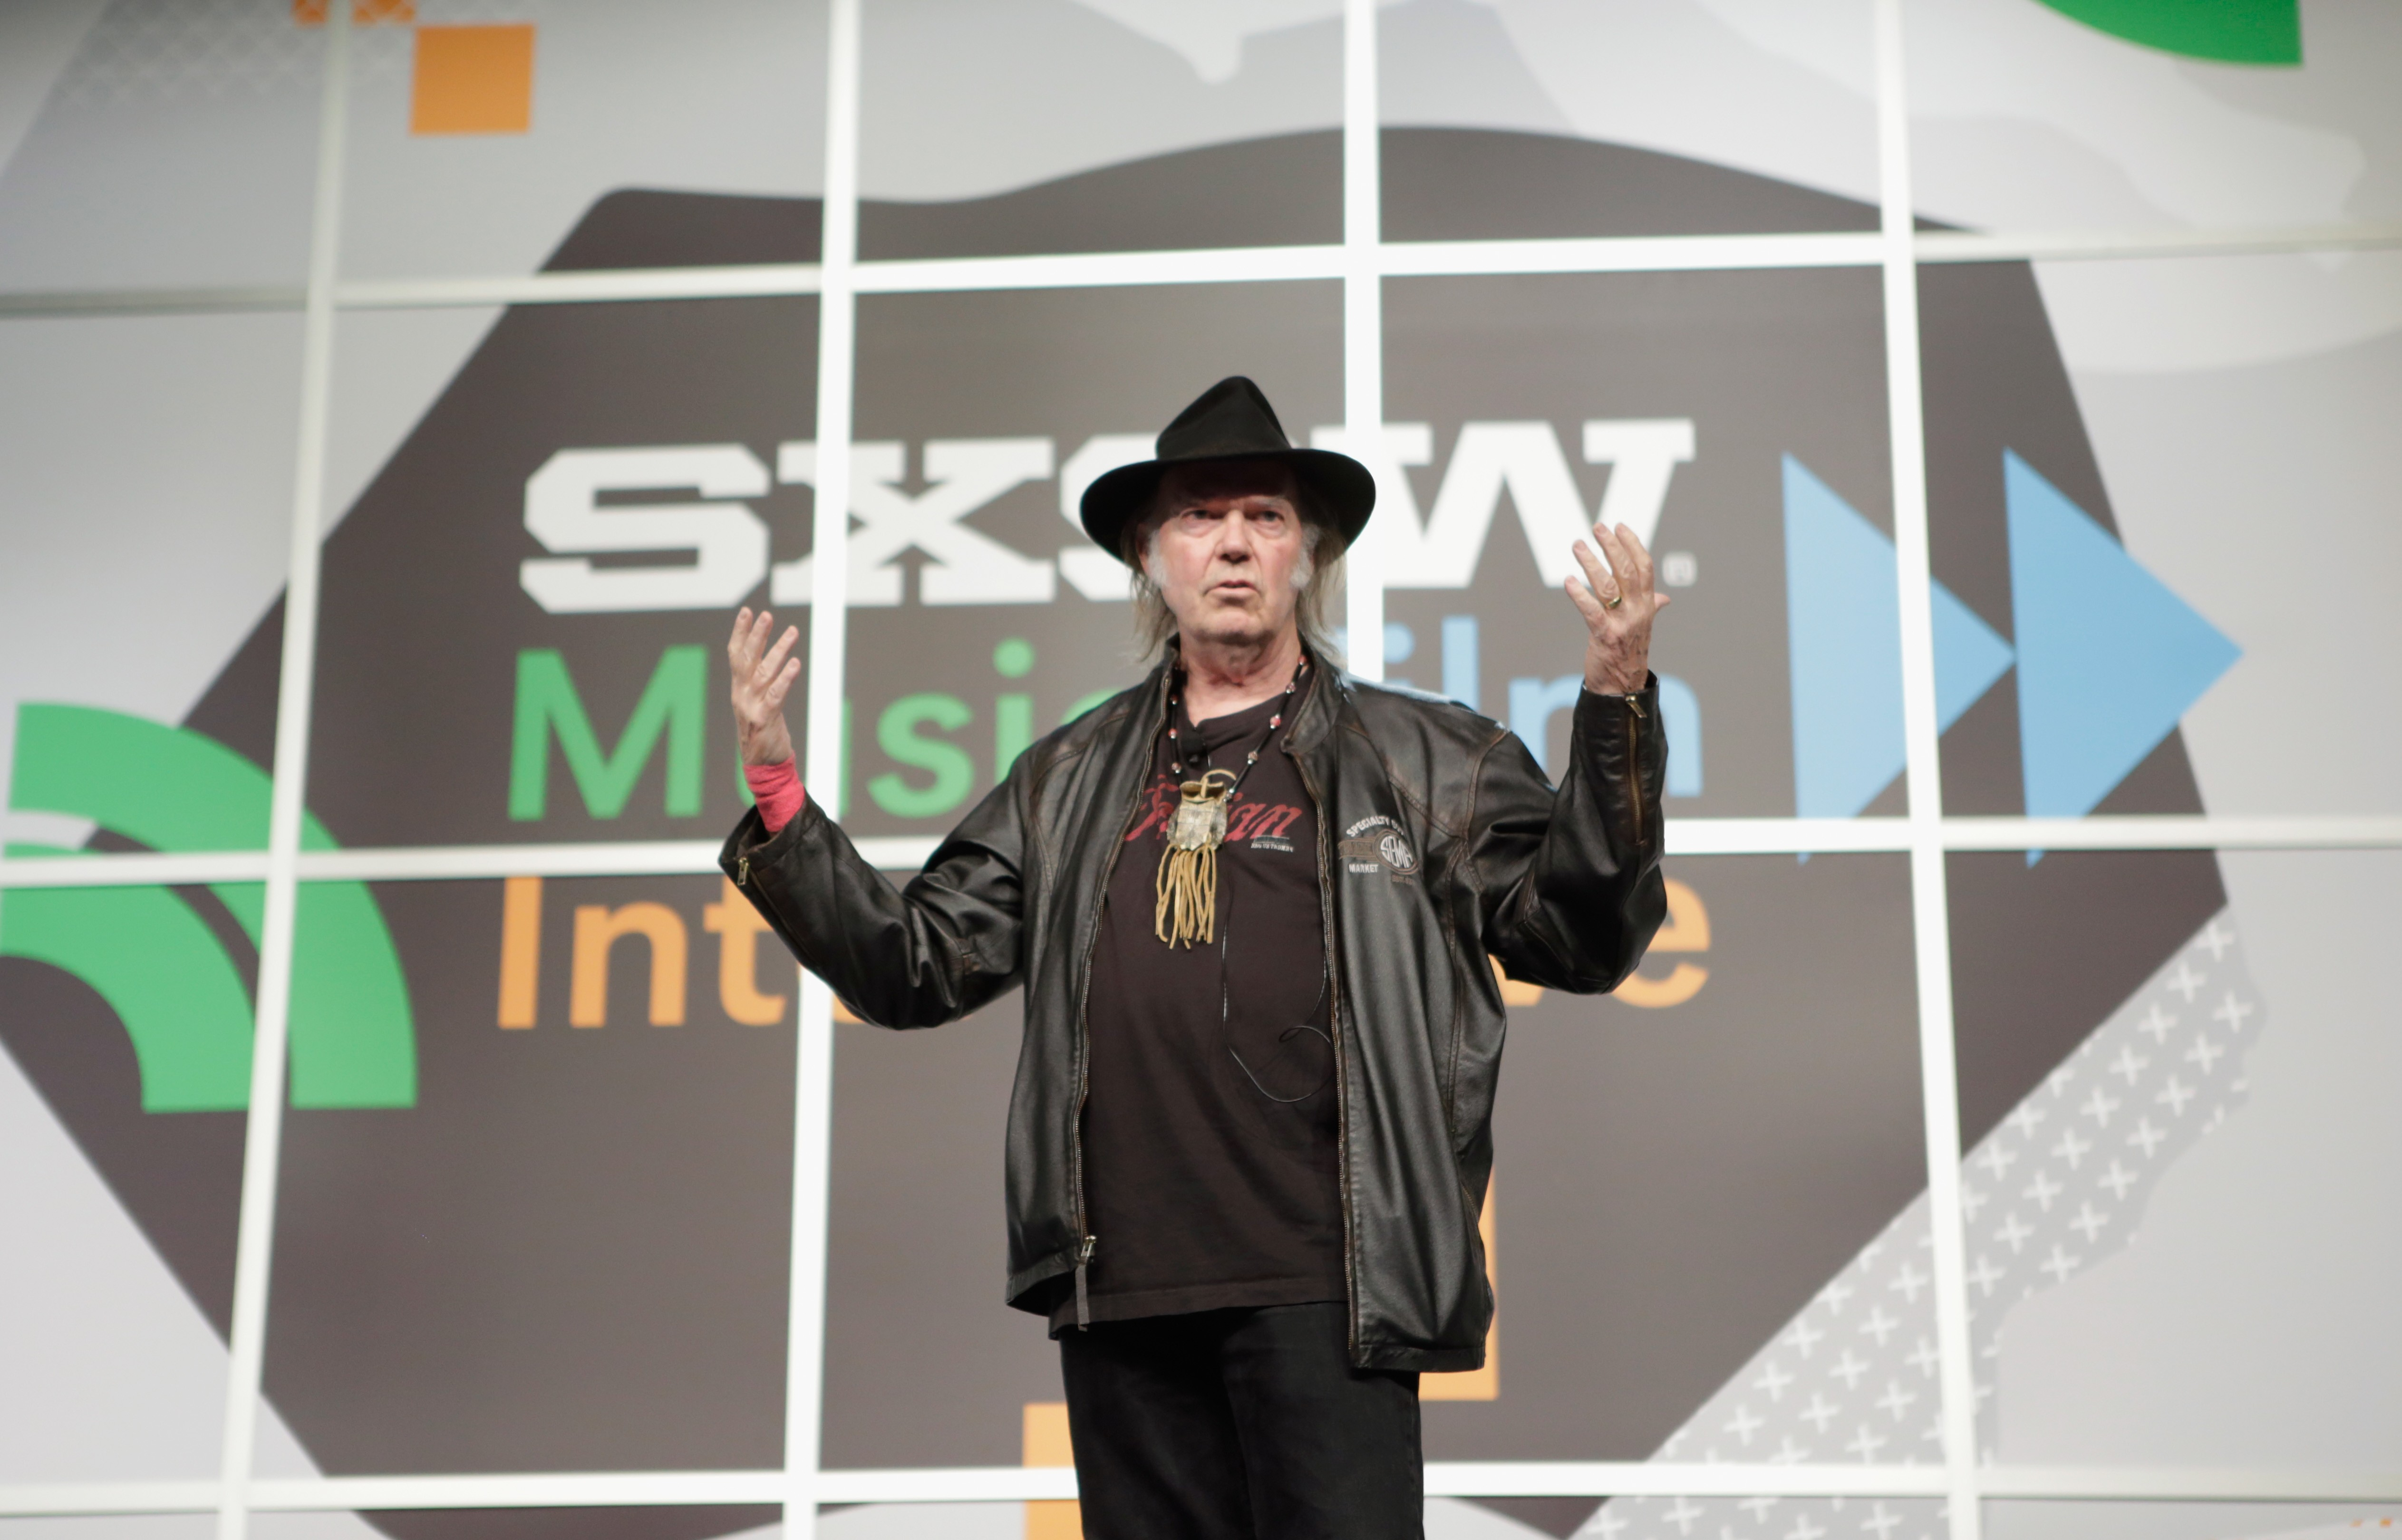 SXSW Interview: Neil Young - 2014 SXSW Music, Film + Interactive Festival